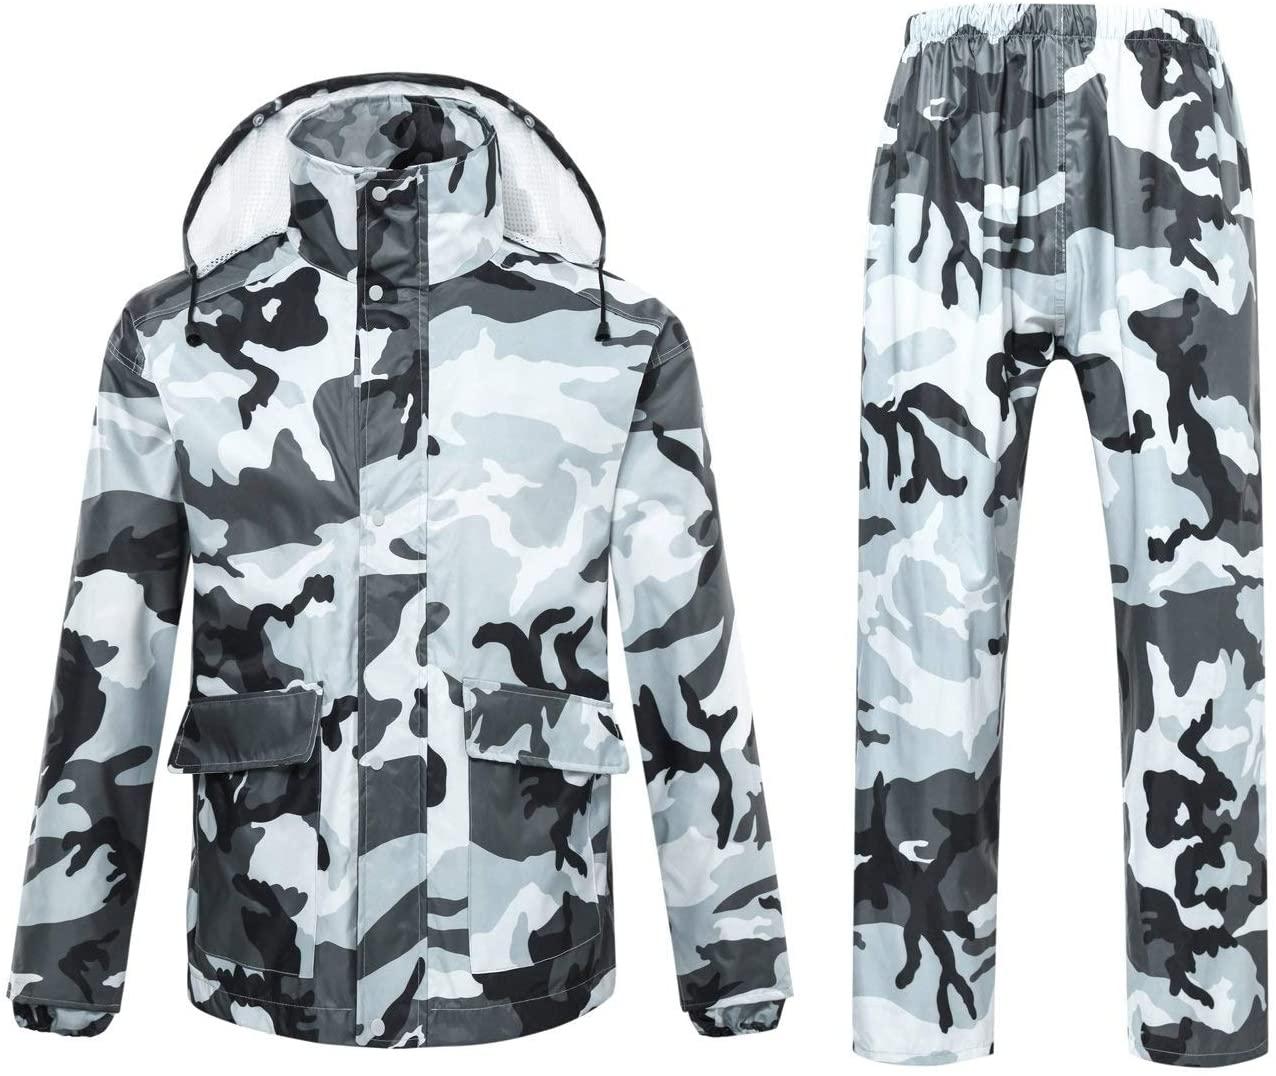 SH-jiake Raincoat Set for Adults Men and Women Reusable Rainwear Adults Waterproof Rainproof Windproof Hooded for Travel Running Cycling (Size : XXL)